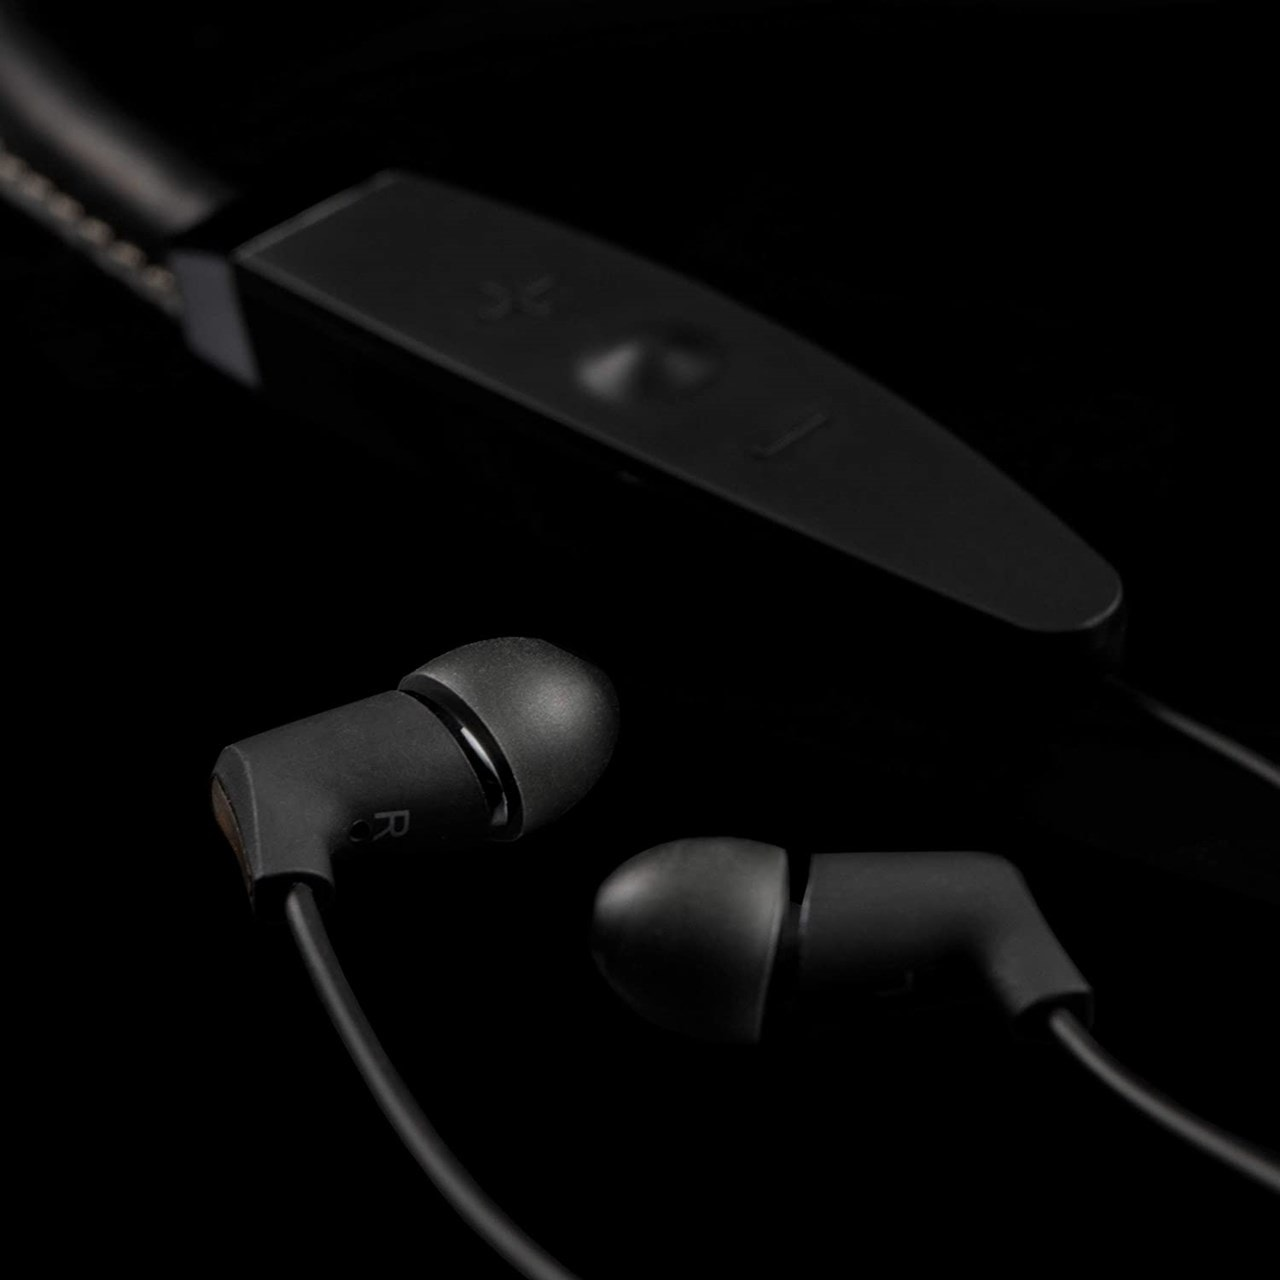 Klipsch R5 Black Neckband Bluetooth Earphones - 2